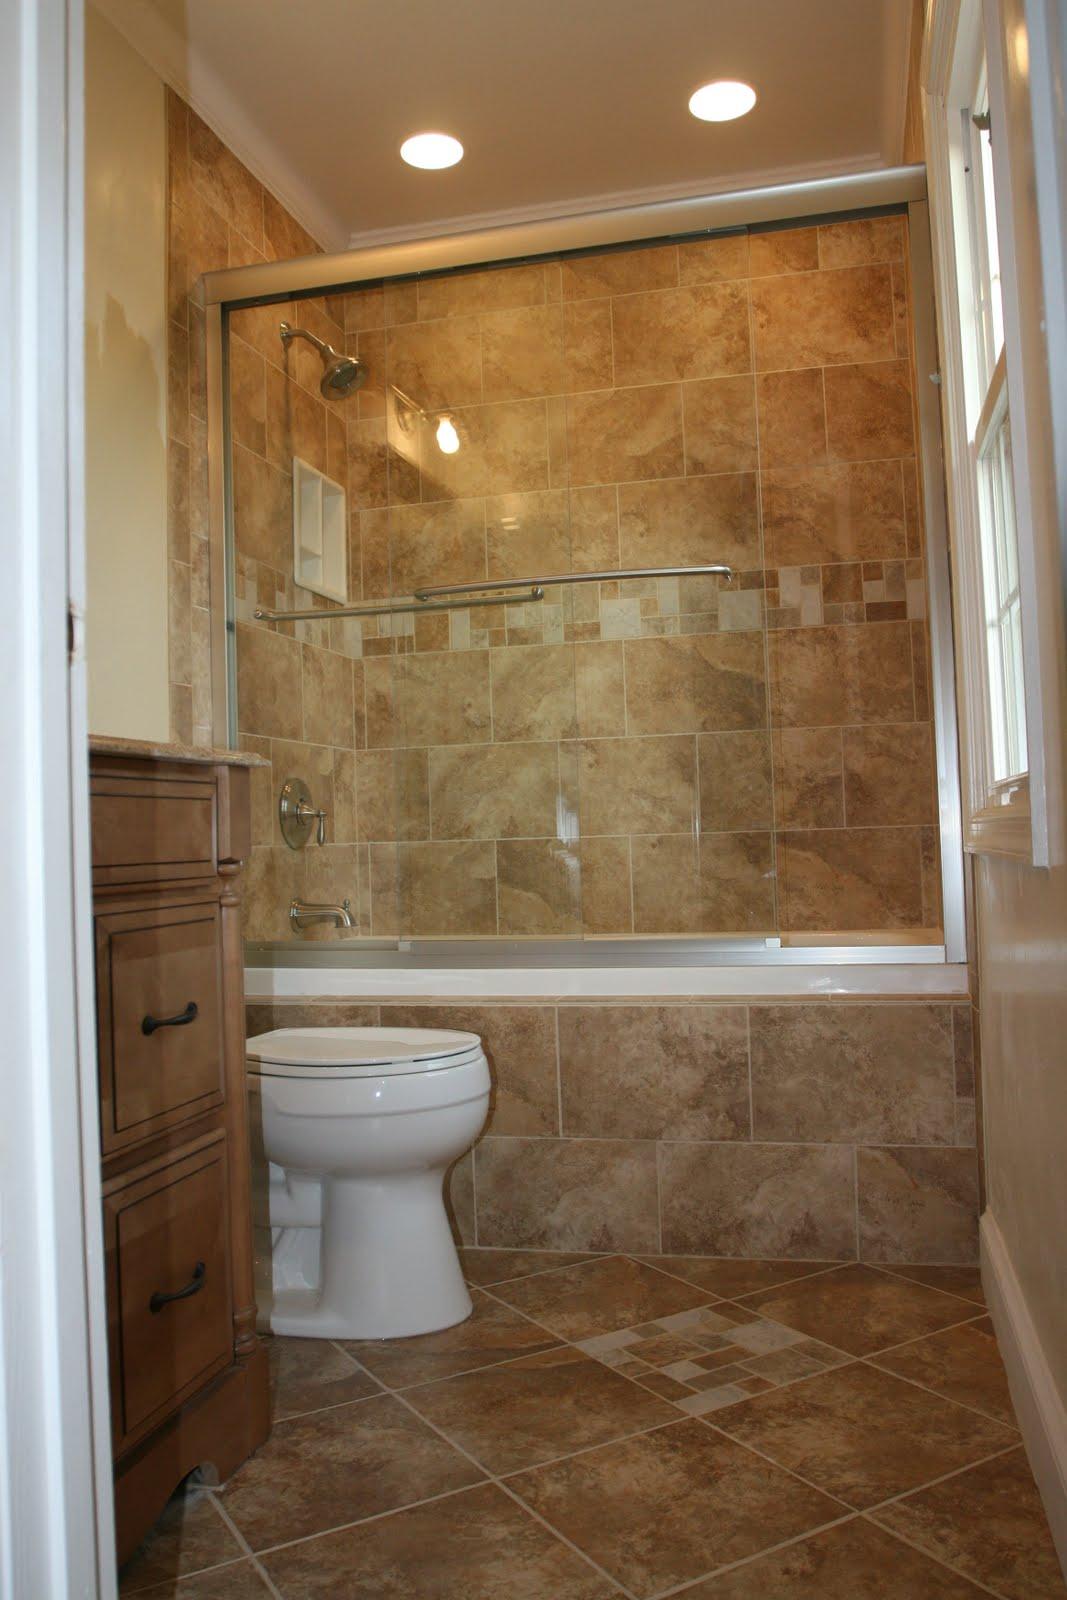 small bathroom shower tub tile ideas Bathroom Remodeling Design Ideas Tile Shower Niches